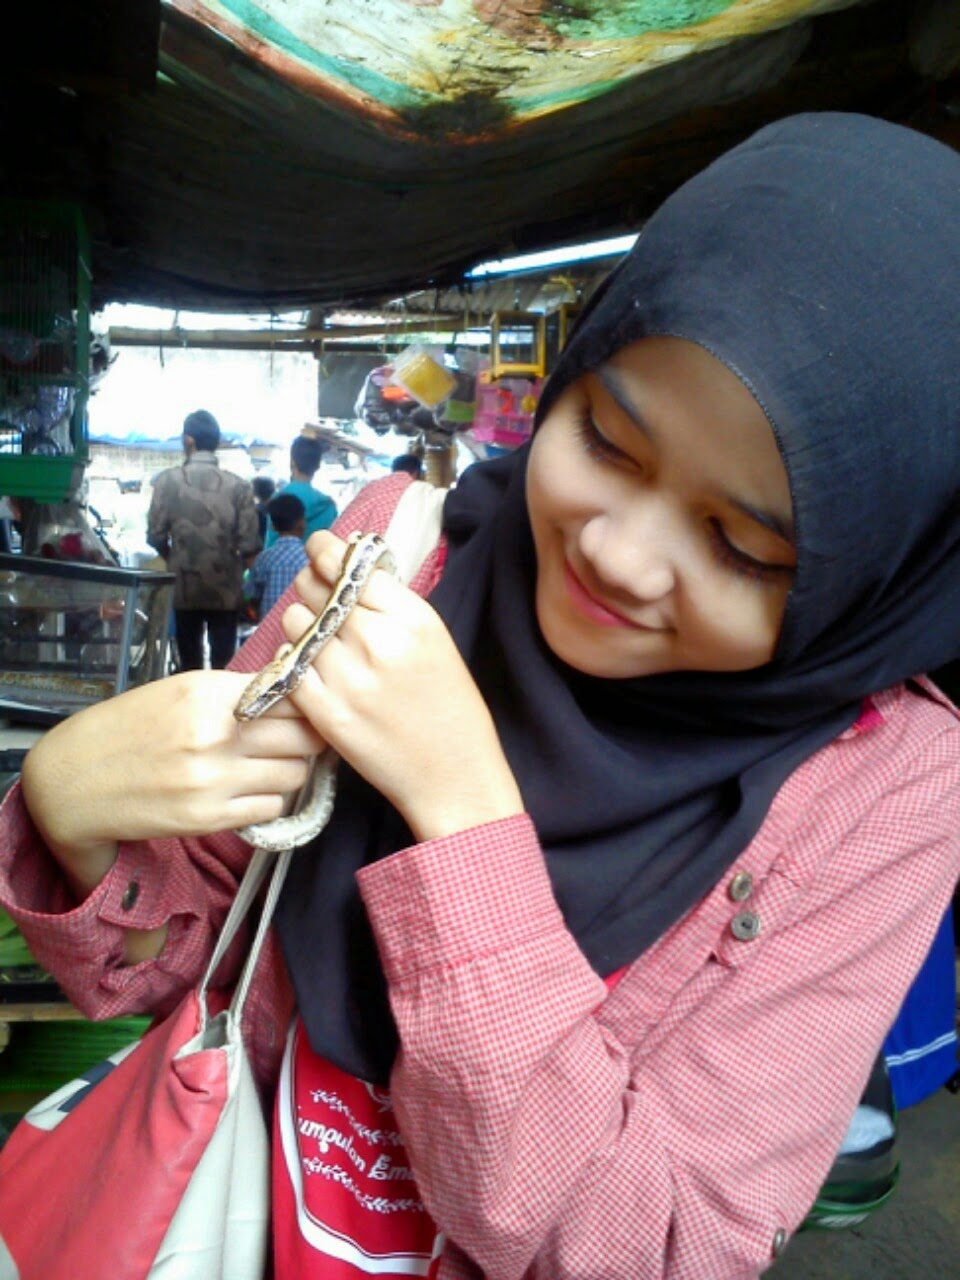 Aku dan Ular di Pasar Burung Sukahaji, Bandung.